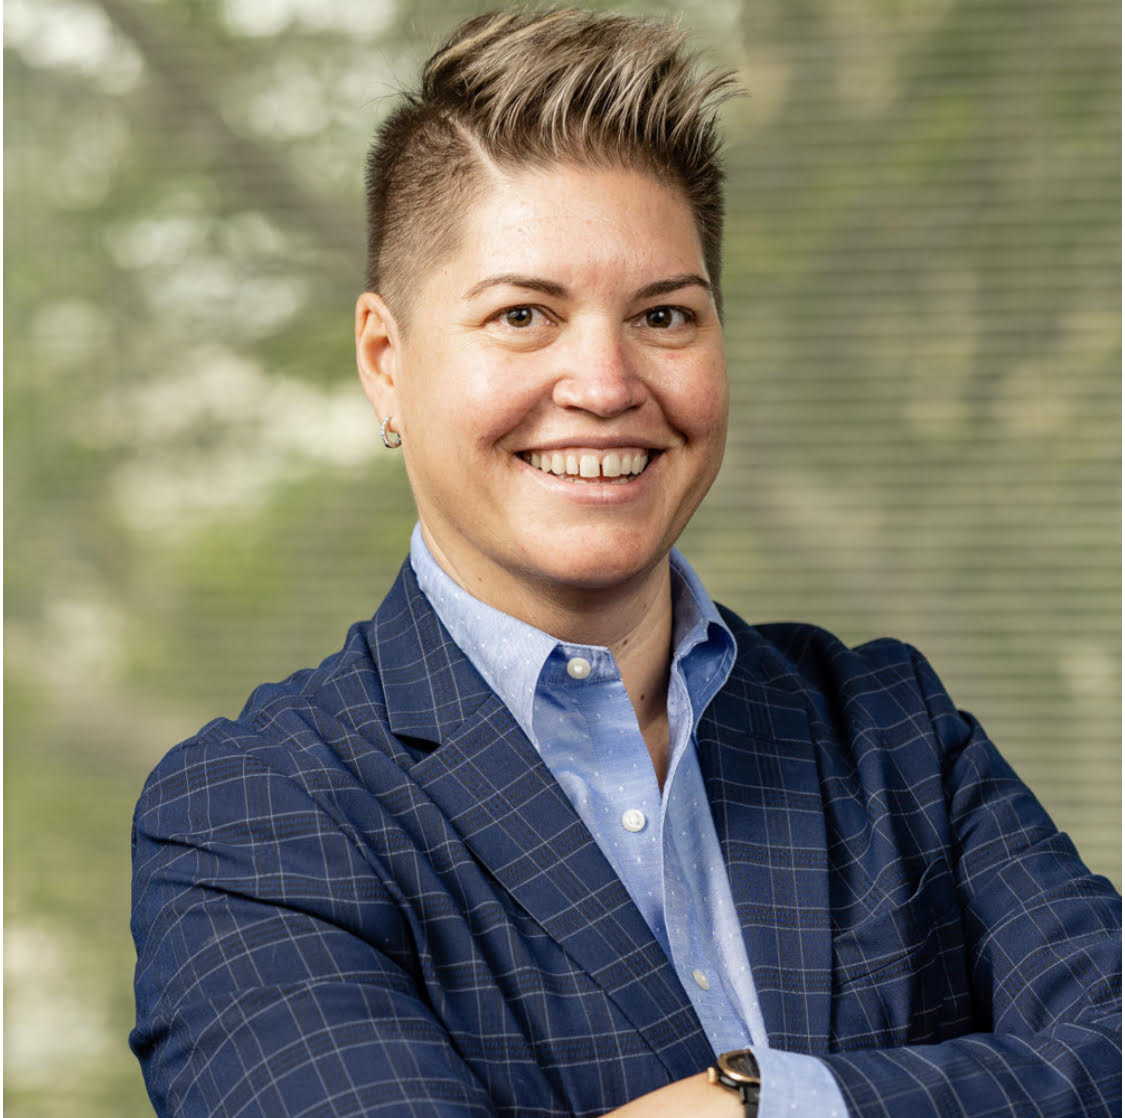 A headshot image of ATSU-Arizona School of Health Sciences alumna Trisha Perry, PT, DPT, '07